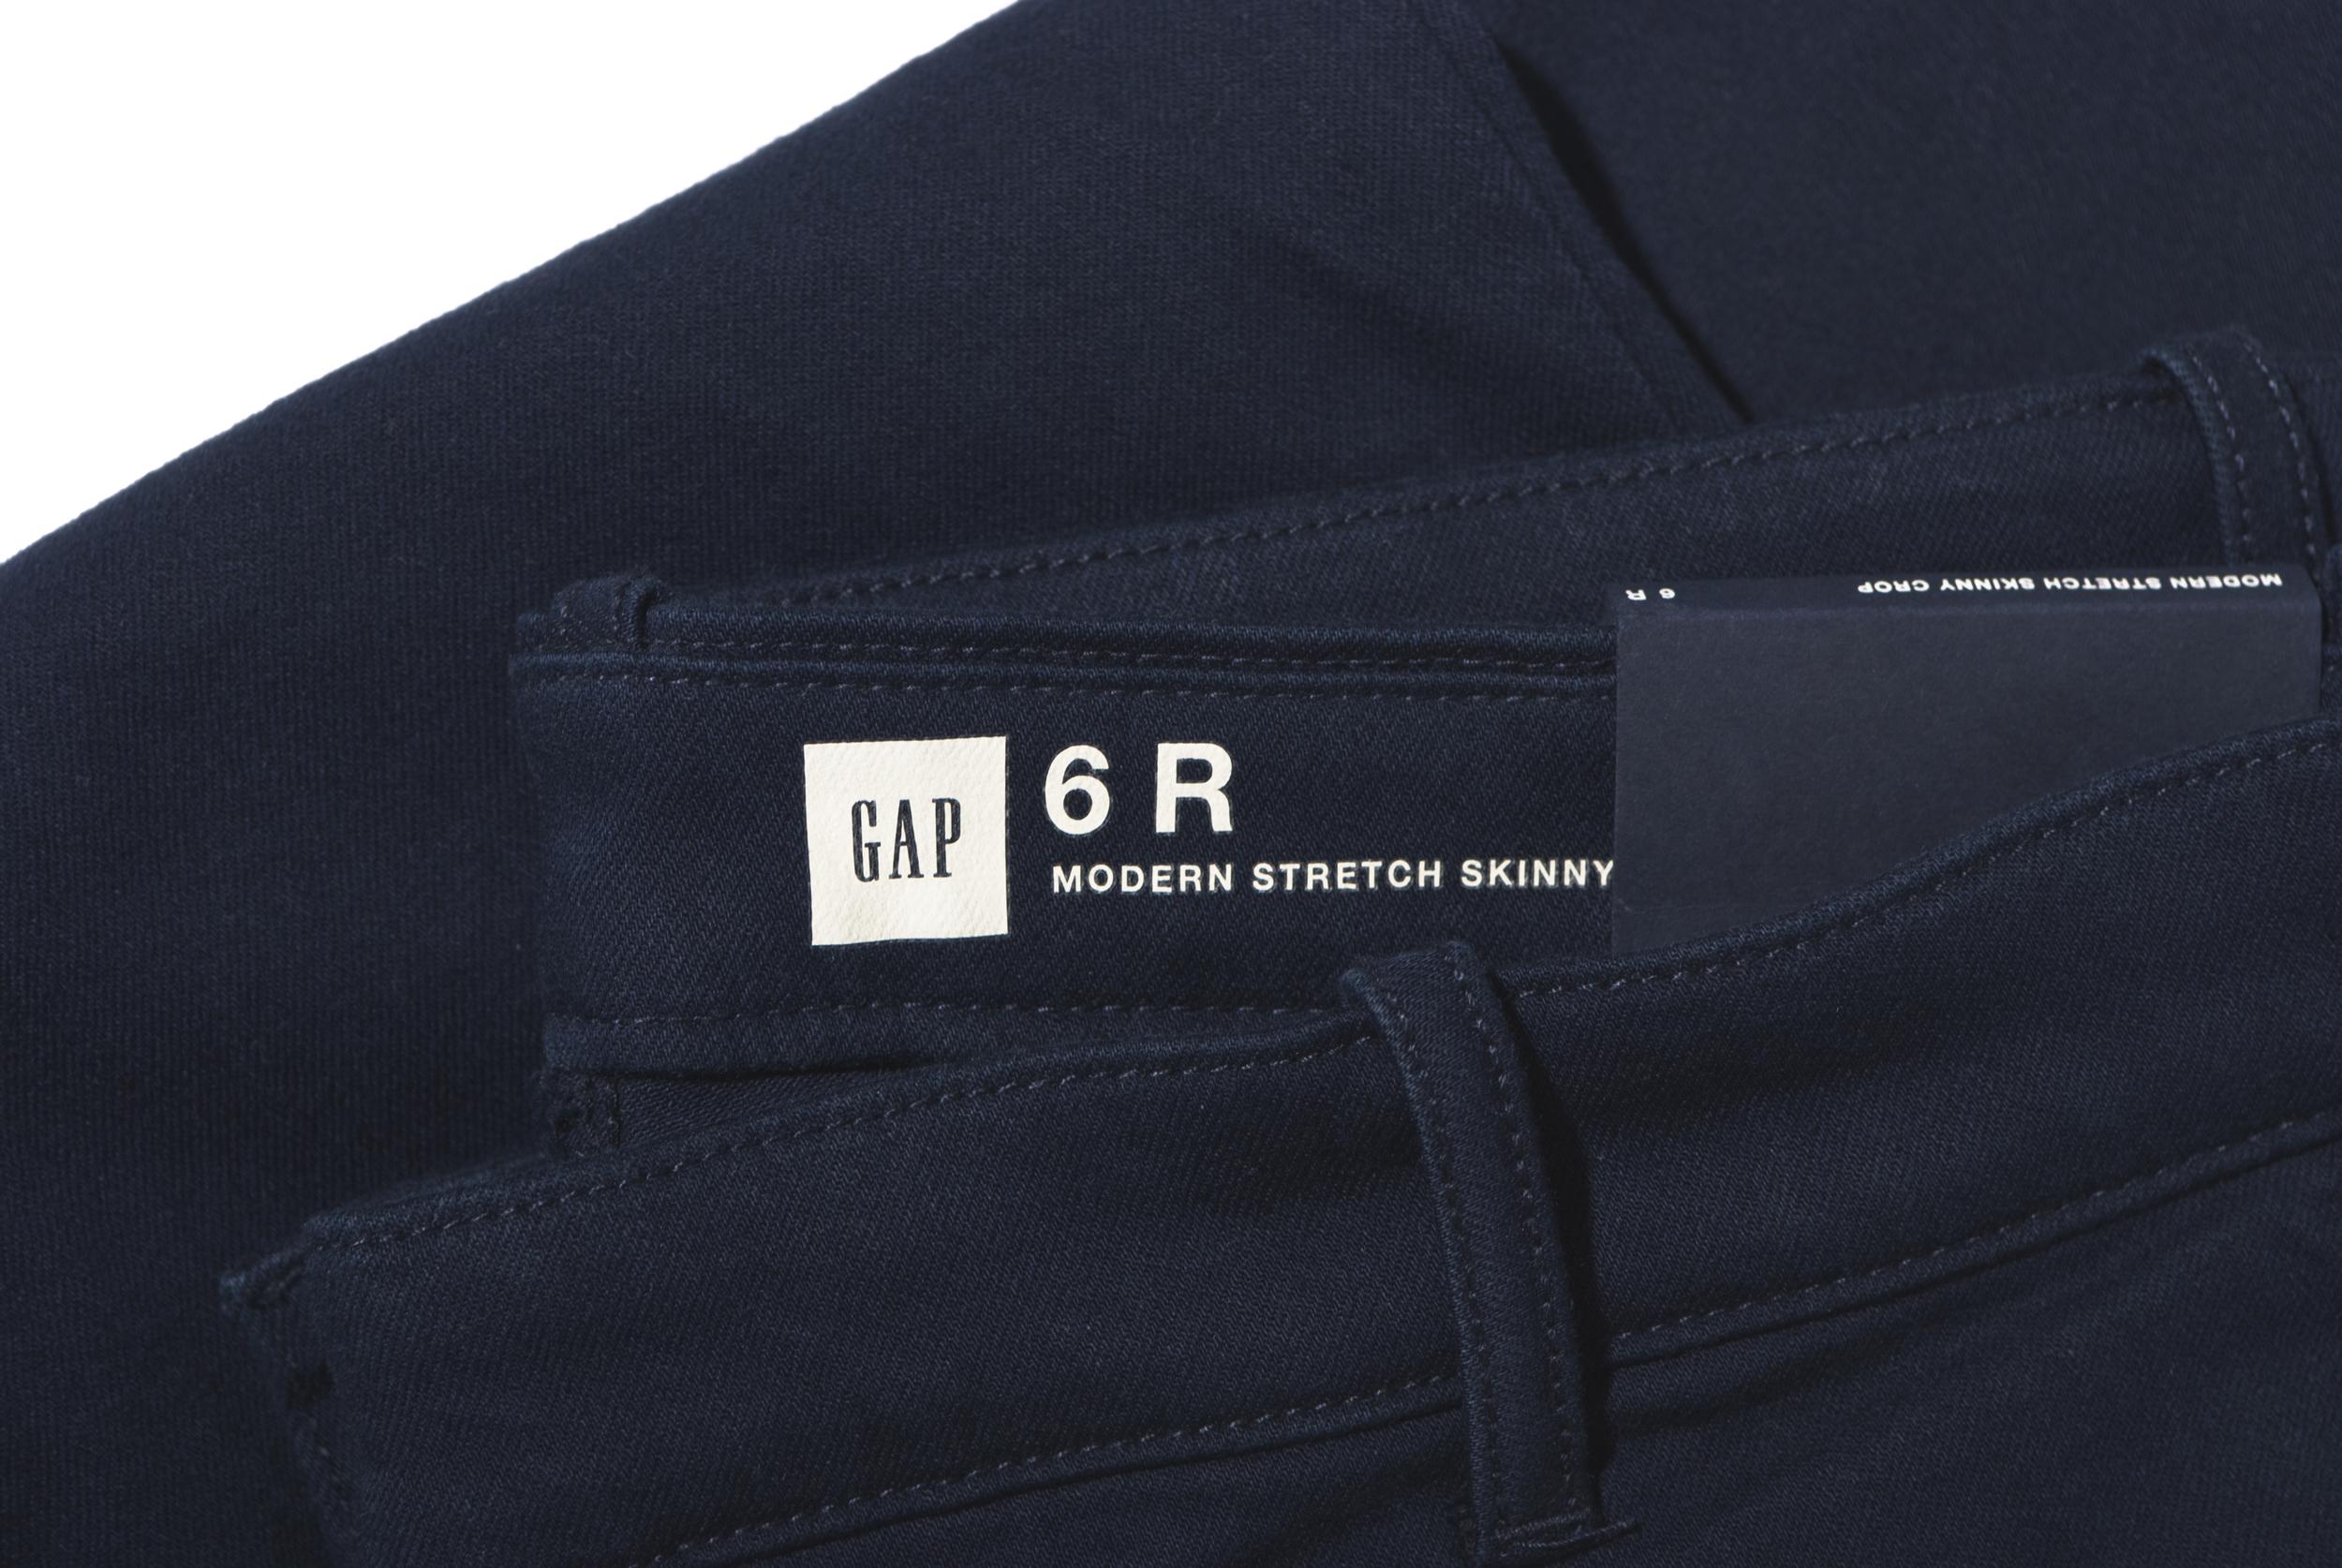 MMBB_GAP_GPR_Bottoms.jpg